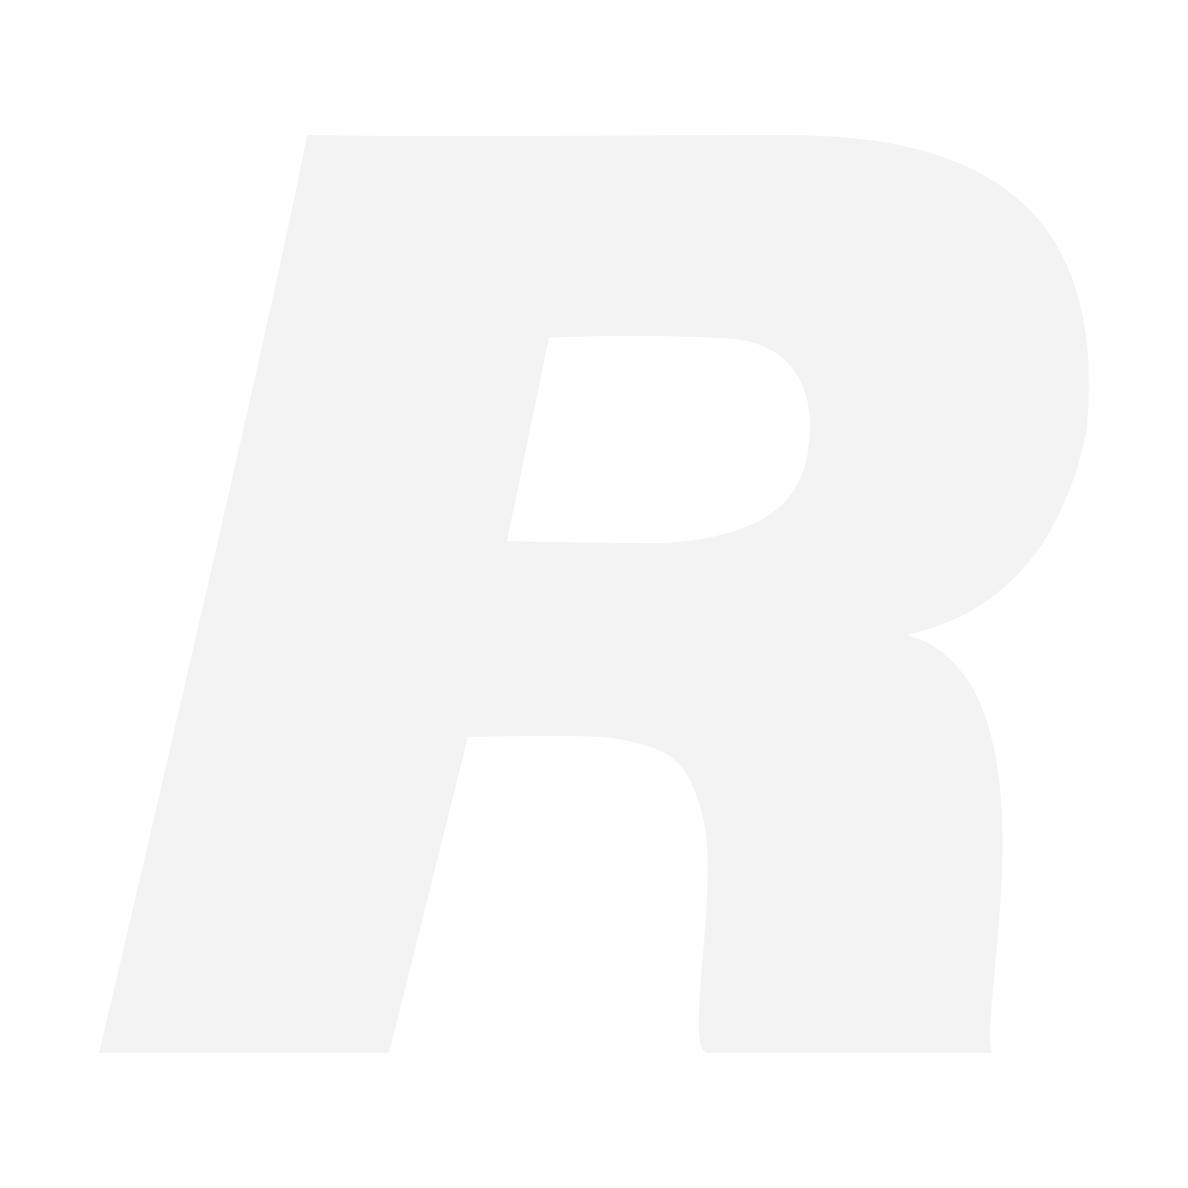 RODE NTG-2 HAULIKKOMIKROFONI